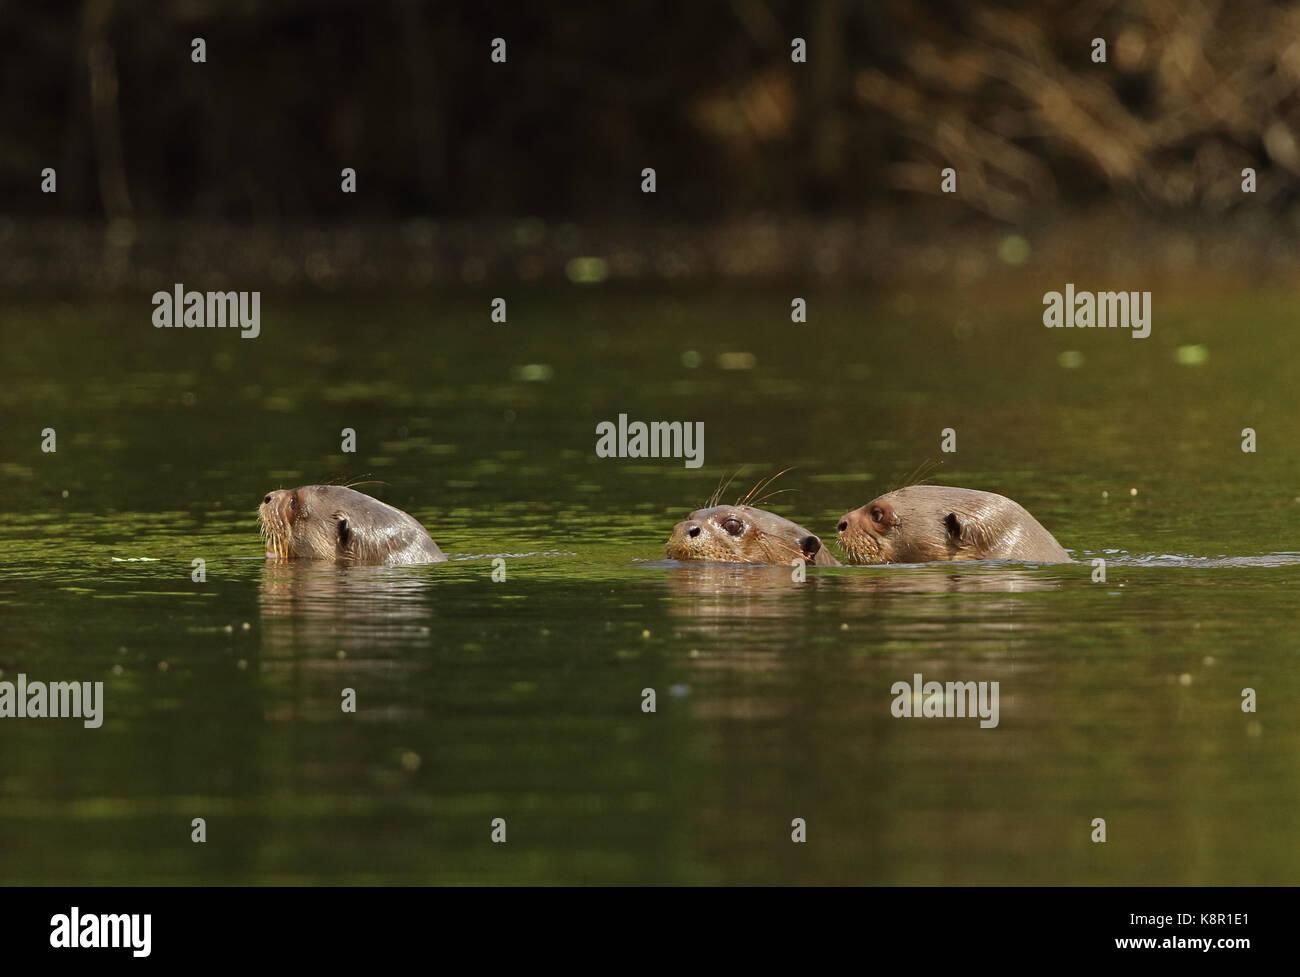 Riesenotter (Pteronura brasiliensis) drei Erwachsene schwimmen im Fluss Inirida, Kolumbien November Stockfoto